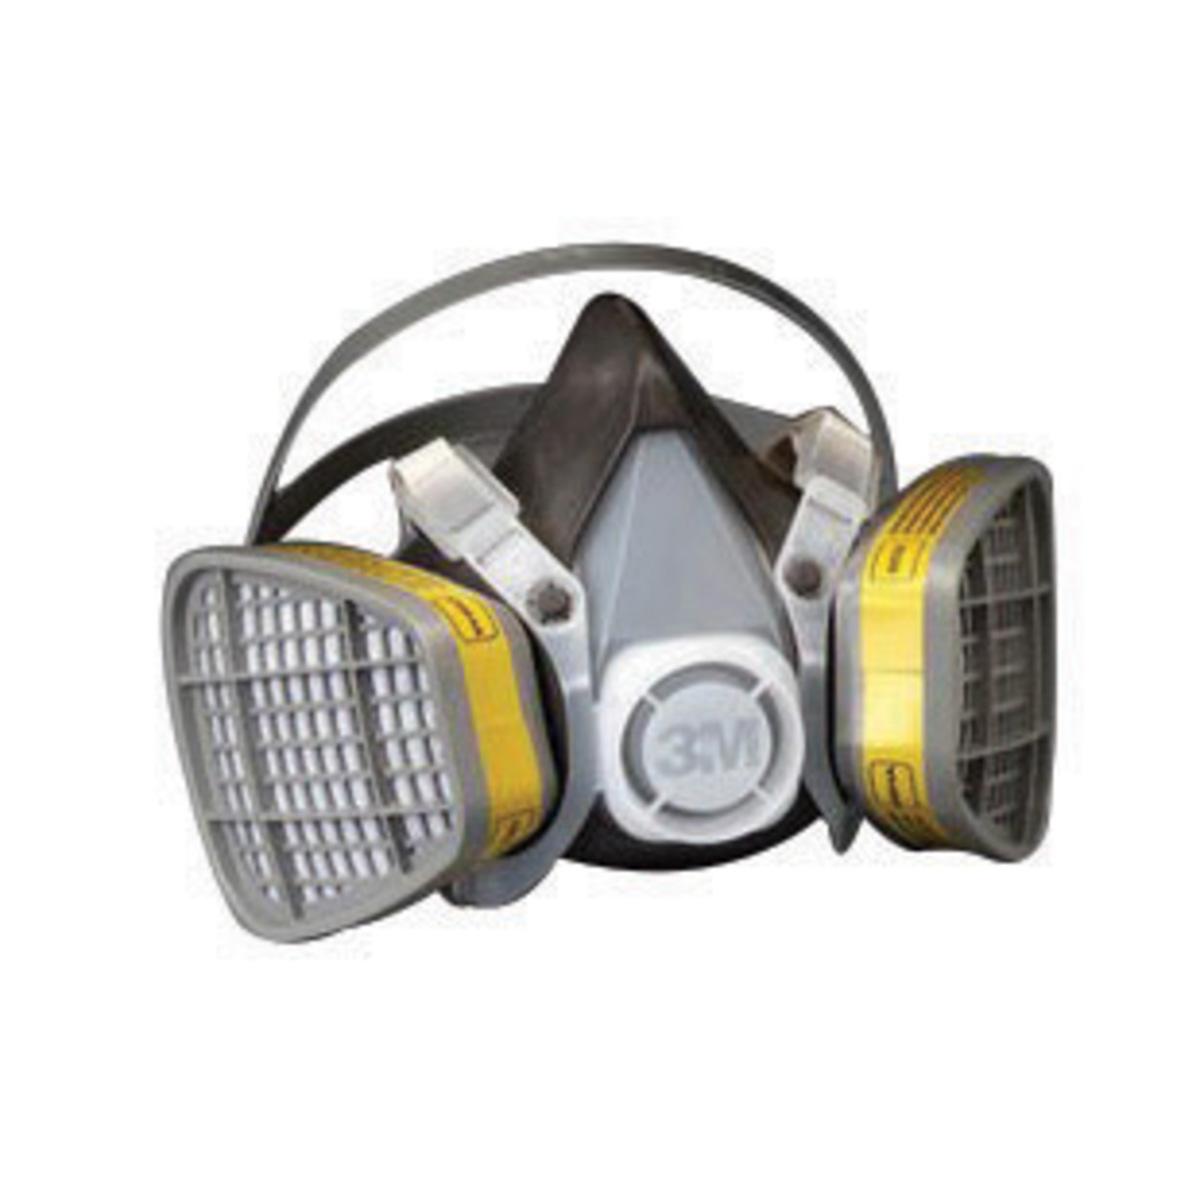 3M™ Large 5000 Series Half Face Disposable Air Purifying Respirator